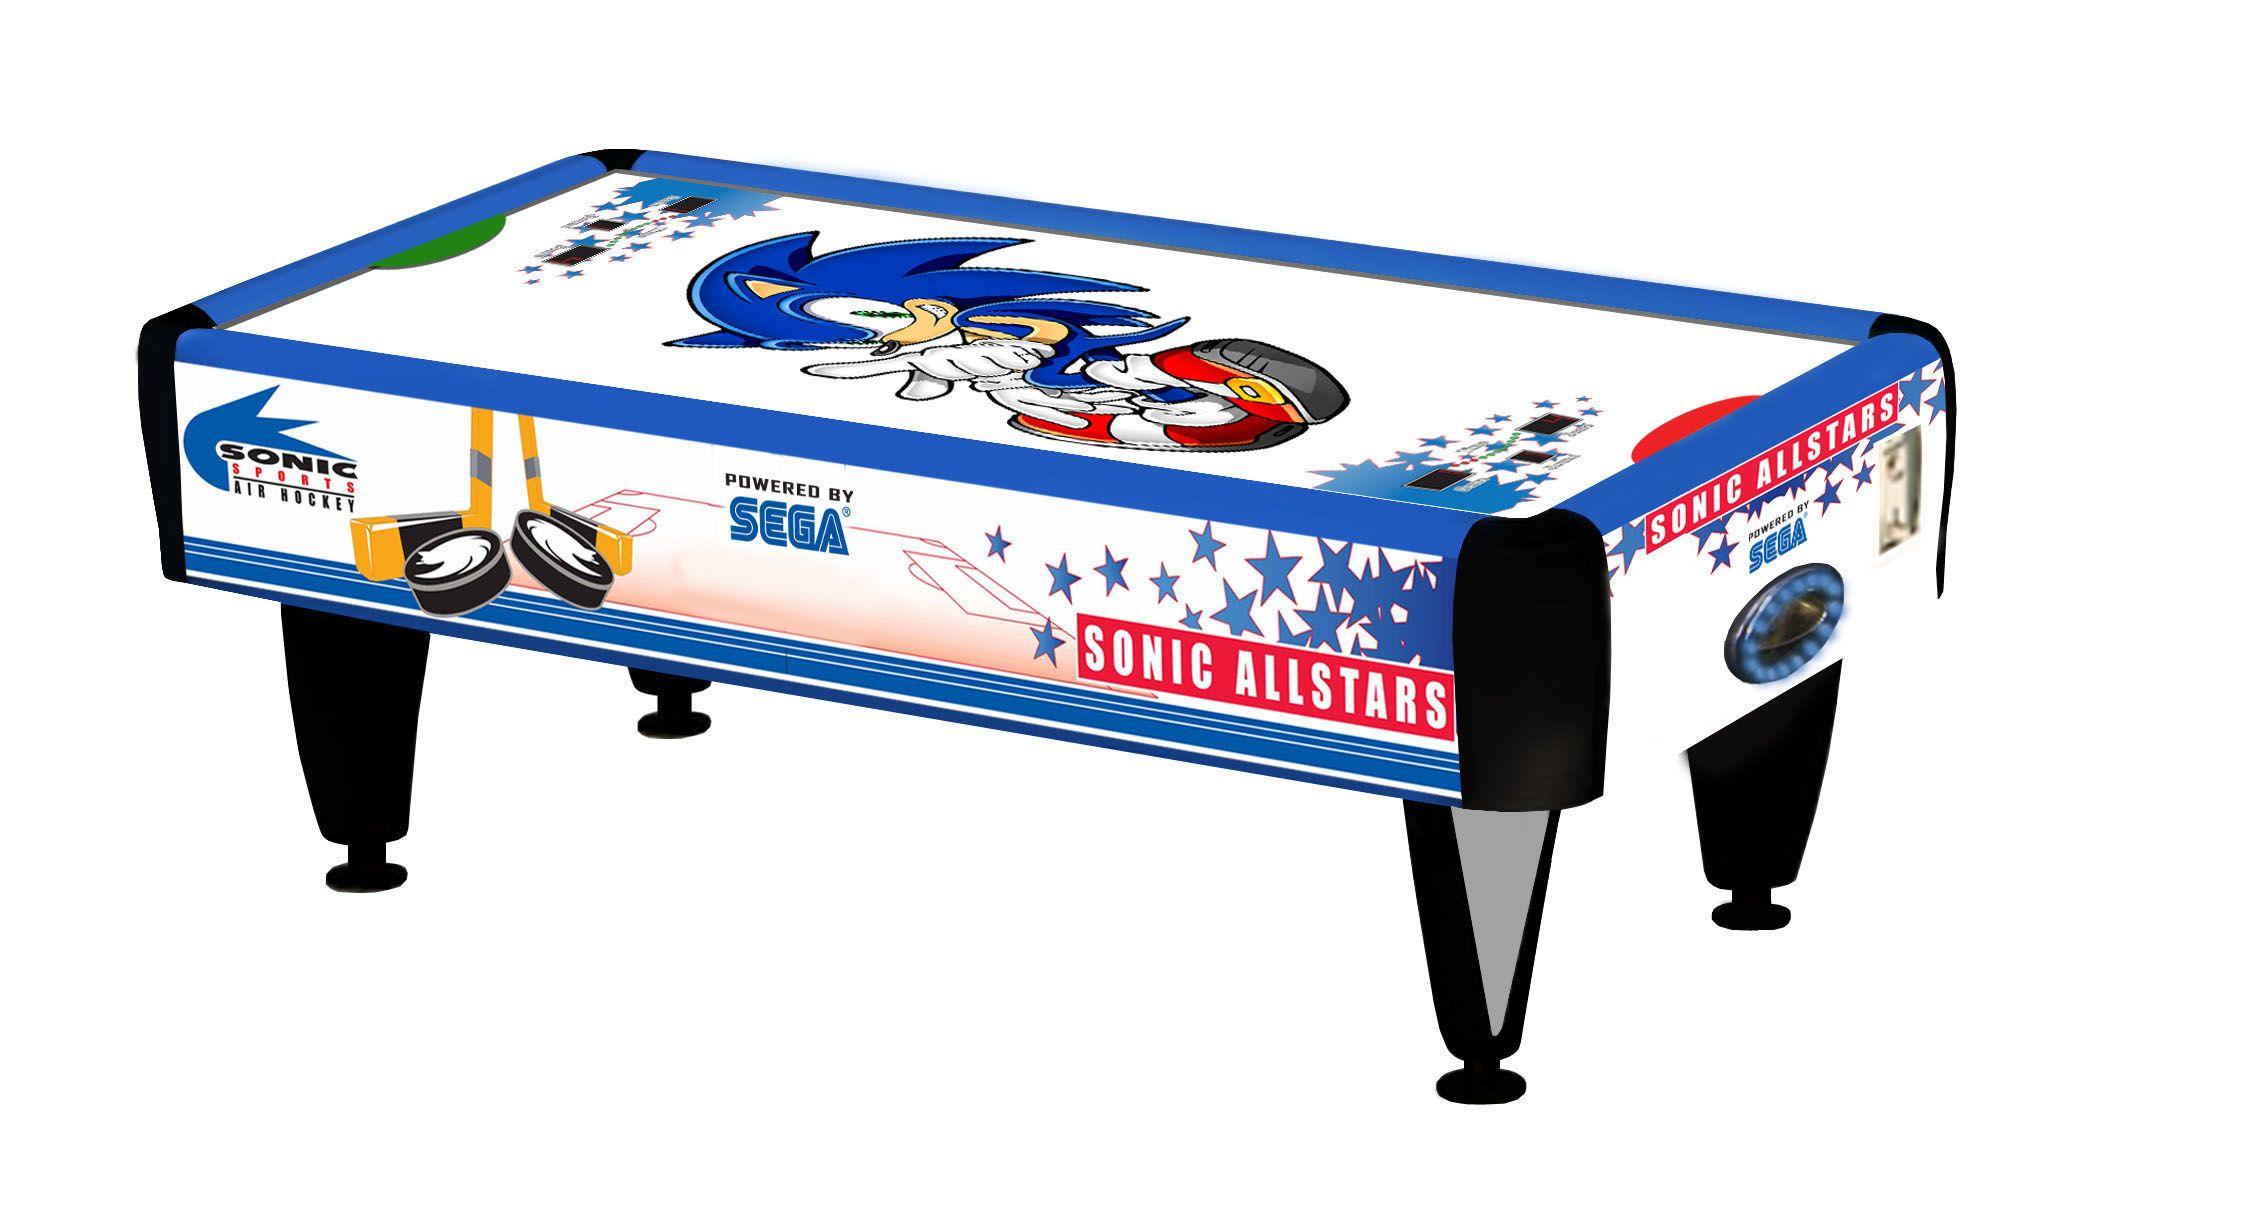 Sonic the Hedgehog air hockey table design! Air hockey